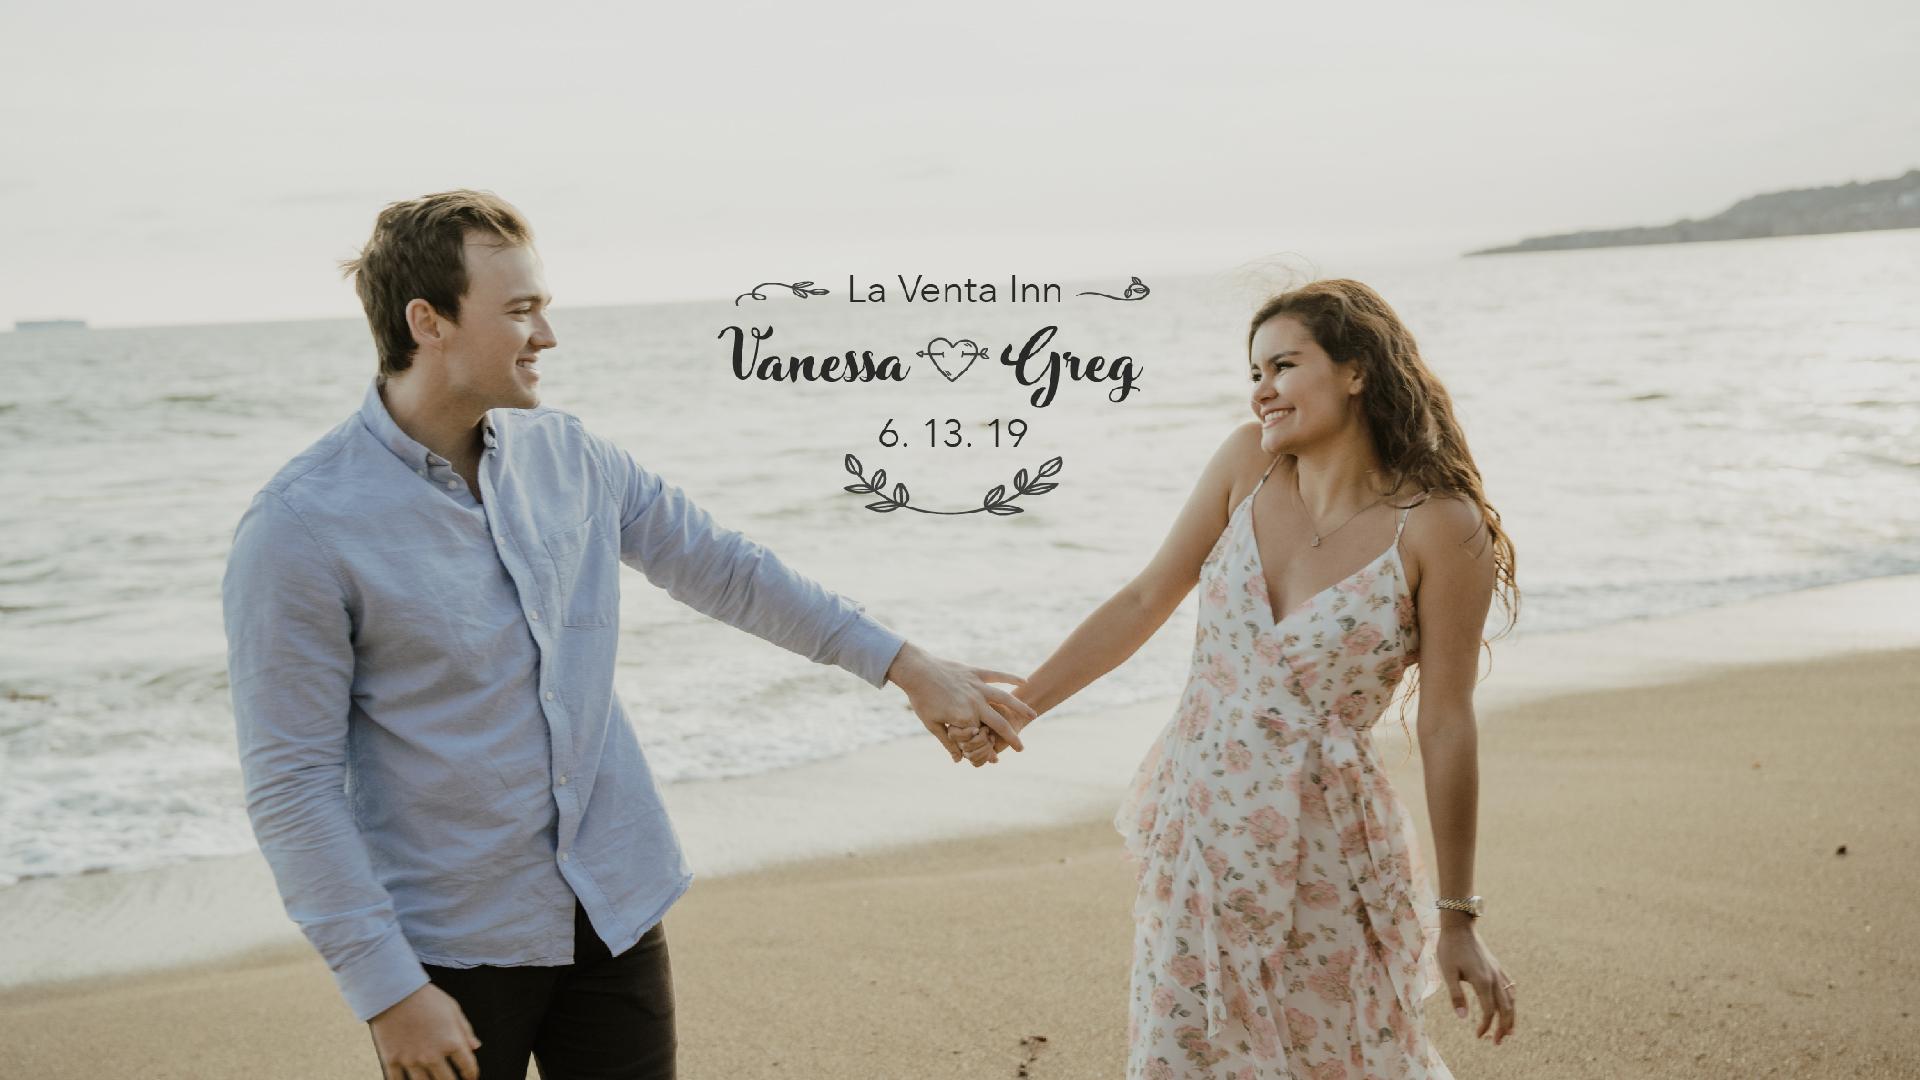 Vanessa + Greg | Rancho Palos Verdes, California | La Venta Inn